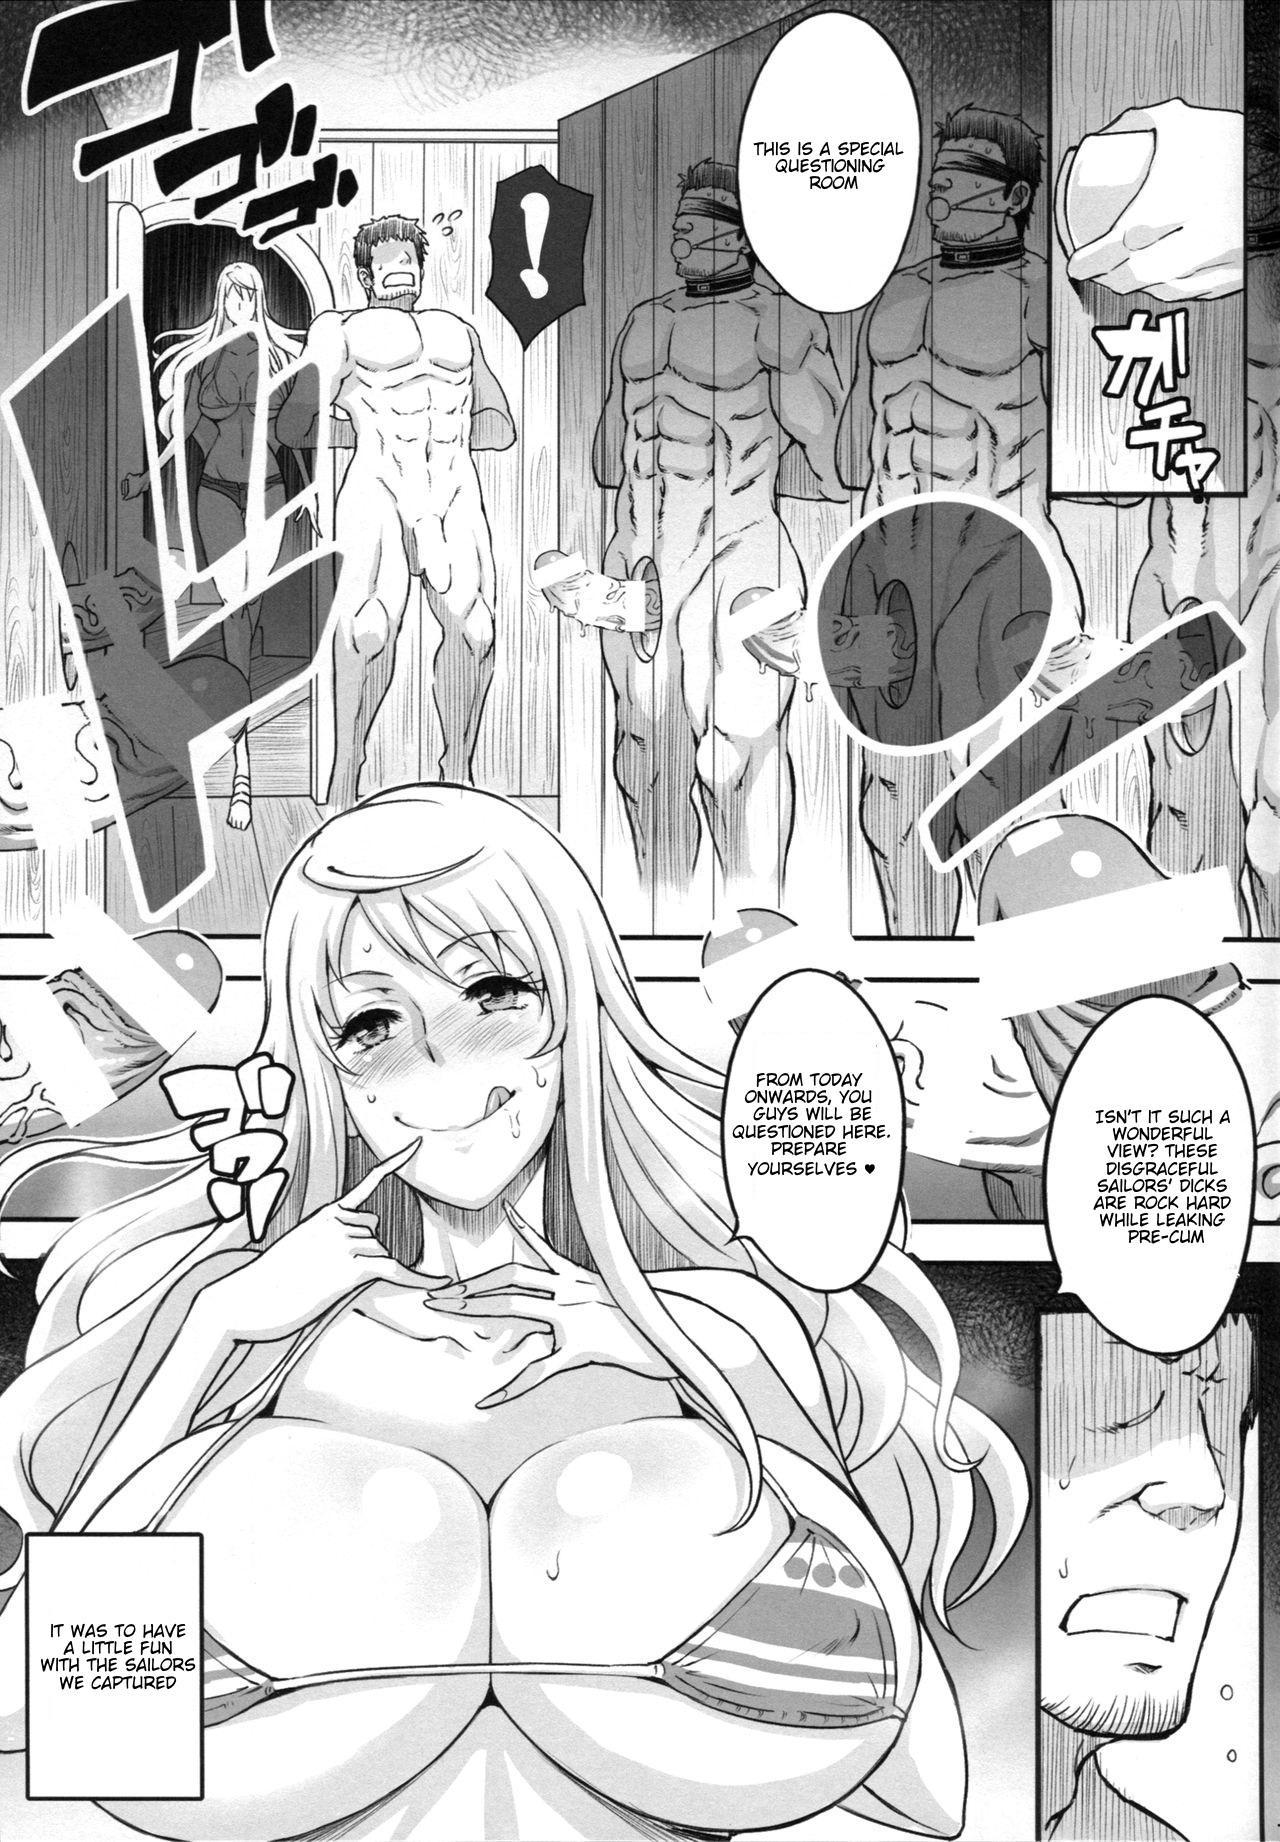 Rakuen Onna Kaizoku 5 - Women Pirate in Paradise 6